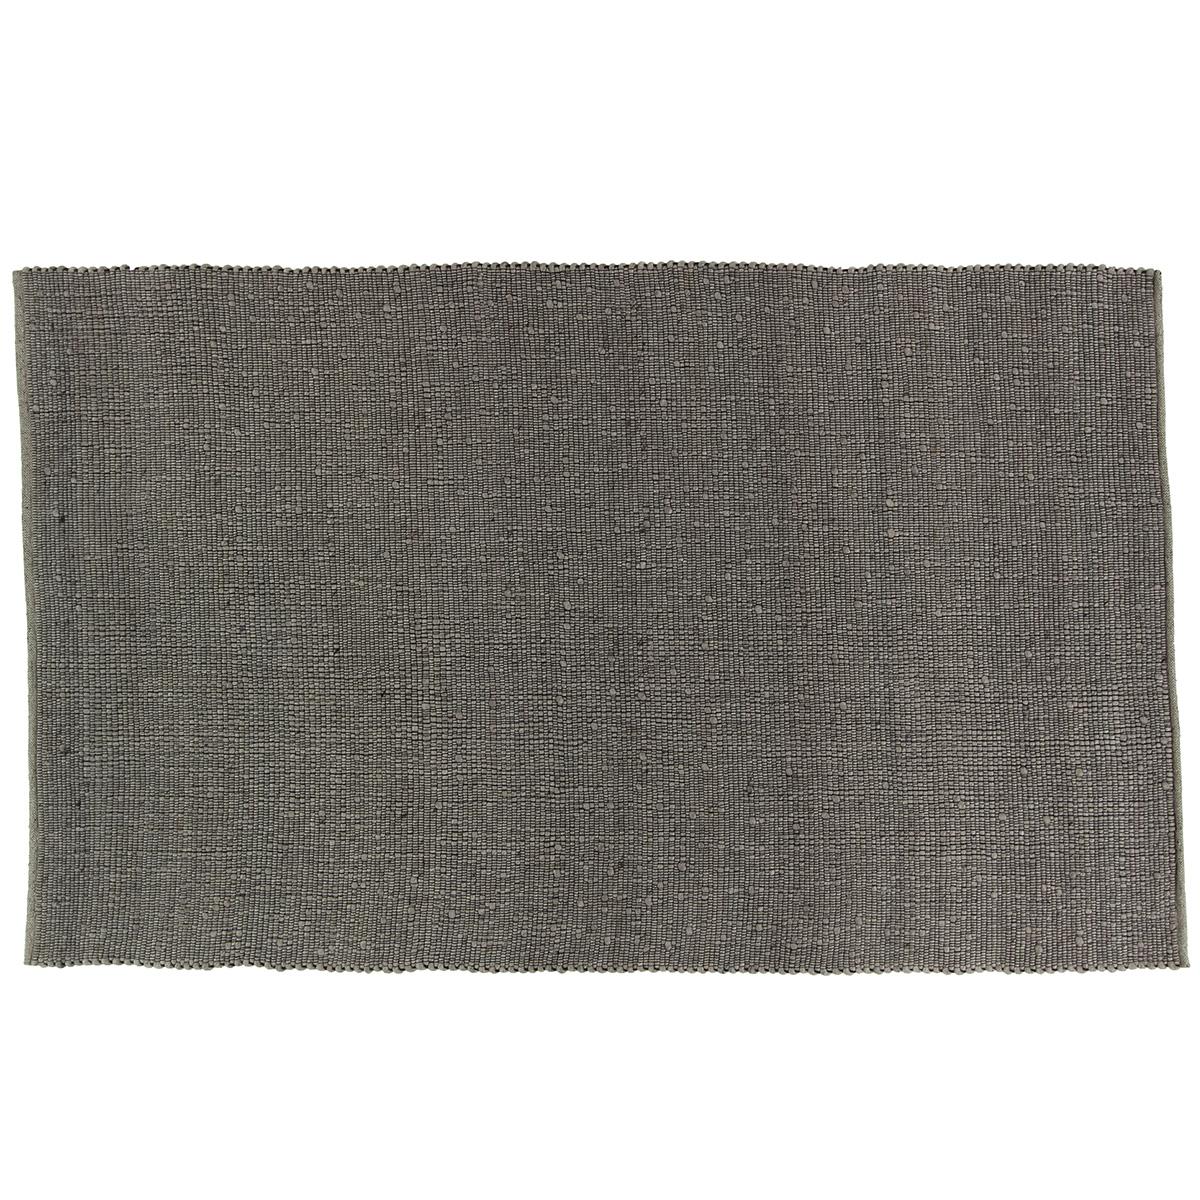 Vloerkleed Brinker Spela Grey | 160 x 230 cm